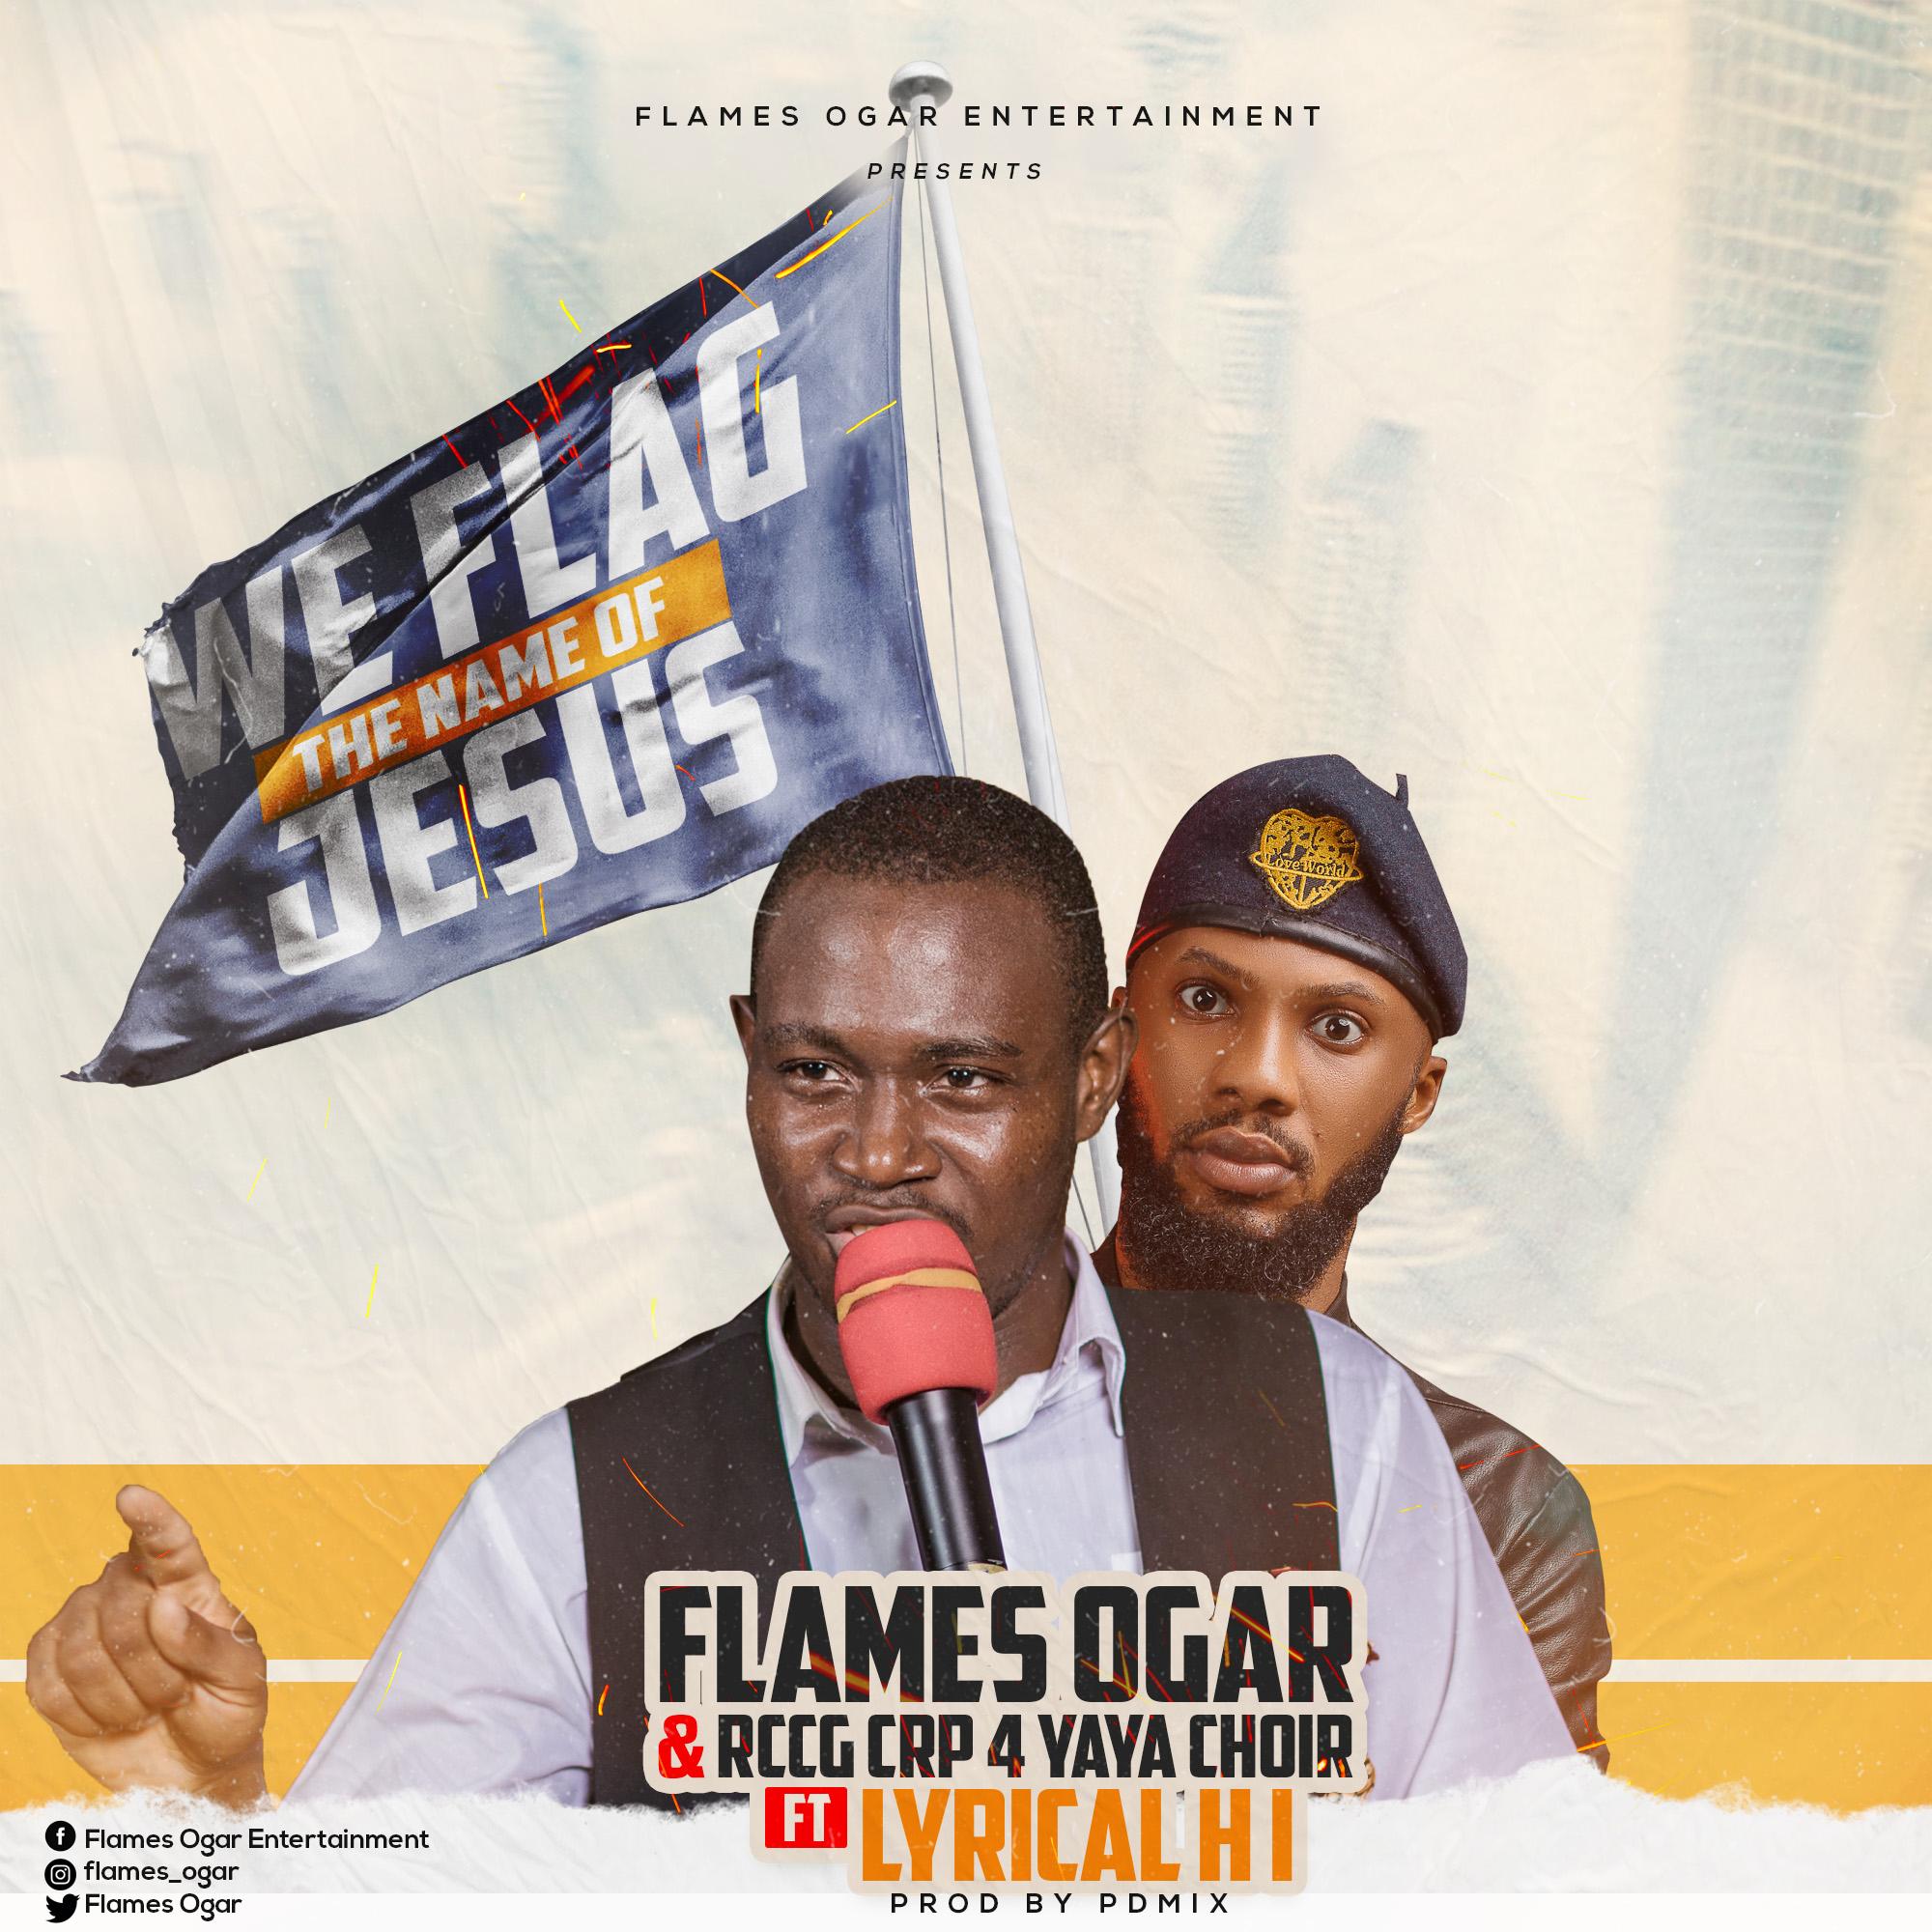 WE FLAG THE NAME OF JESUS - Flames Ogar